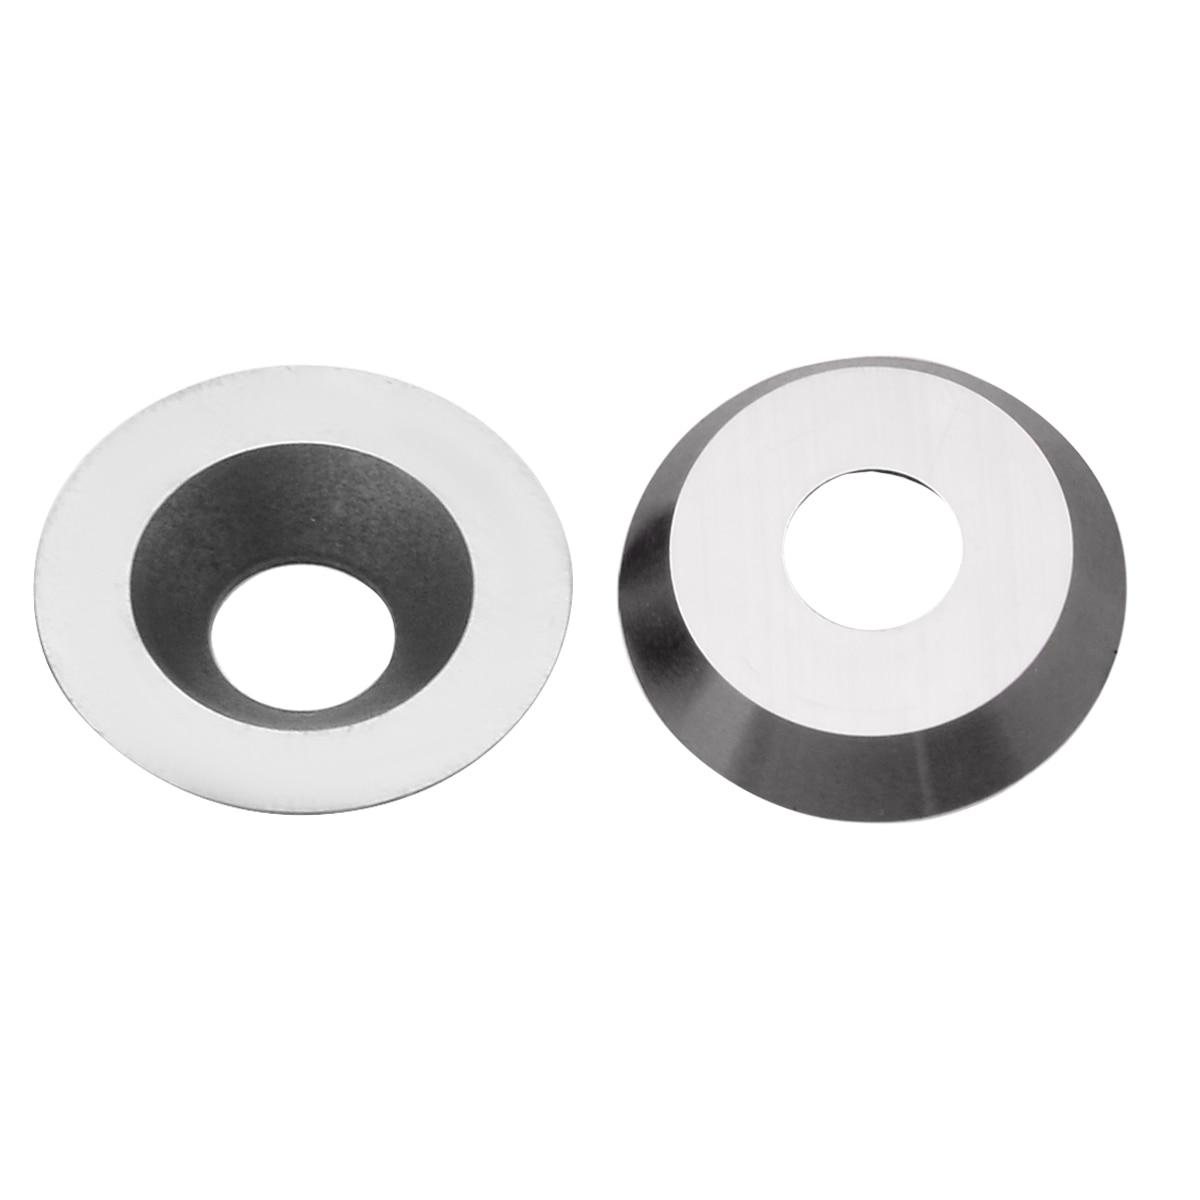 10pcs 5/8 Inch 16mm Diameter Round Carbide Inserts Milling Cutter For Wood Turning Tools картридж xerox копи картридж 013r00589